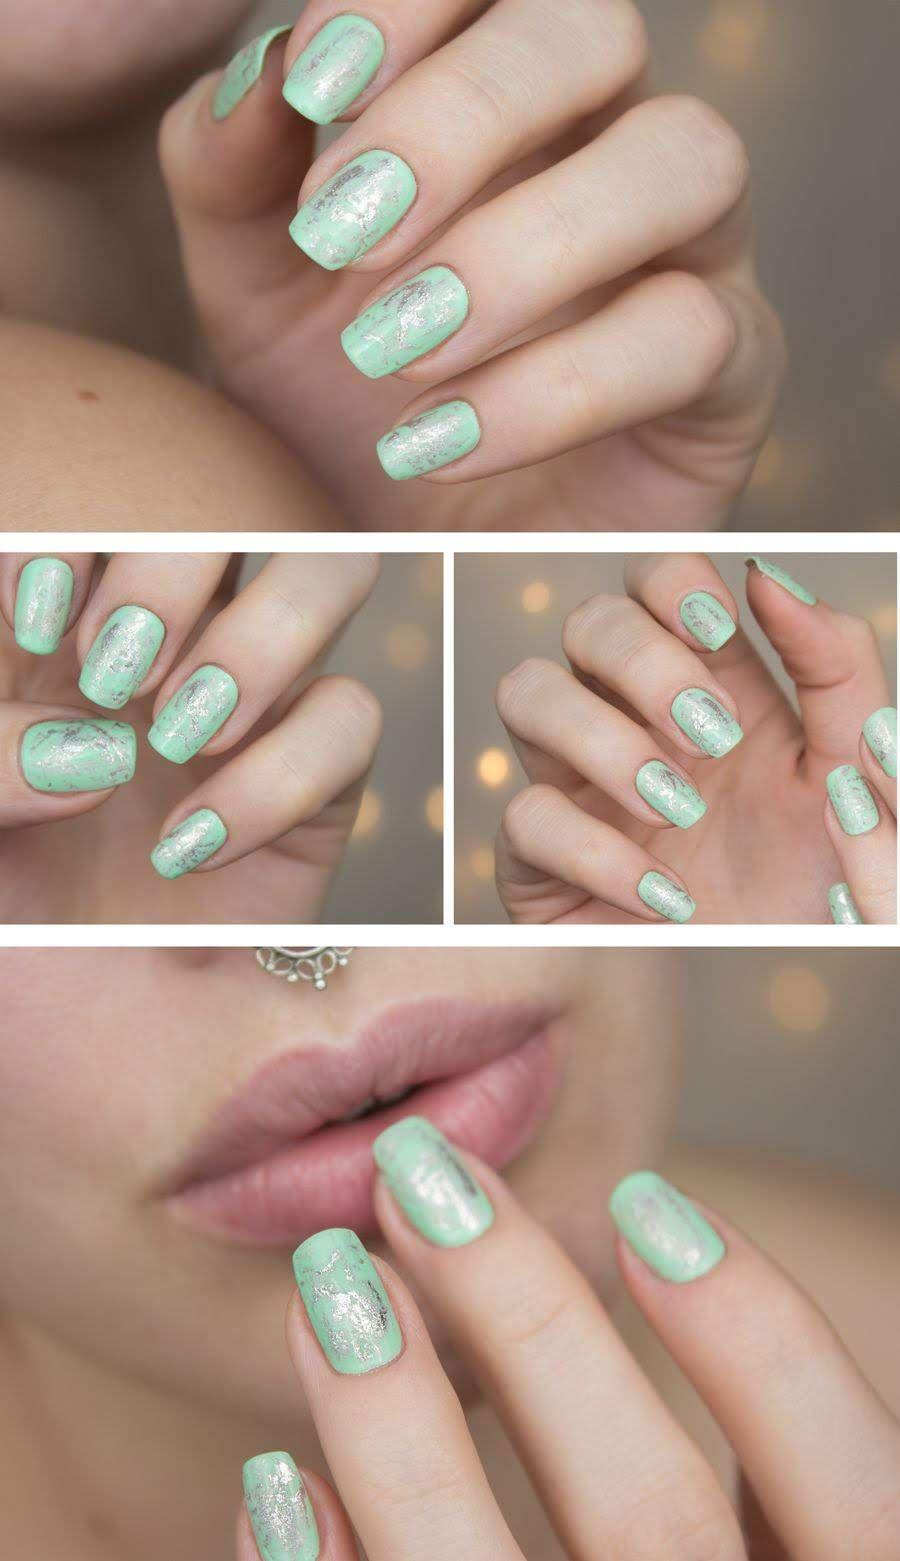 Pin by charleen on Uñas | Long acrylic nails, Luxury nails